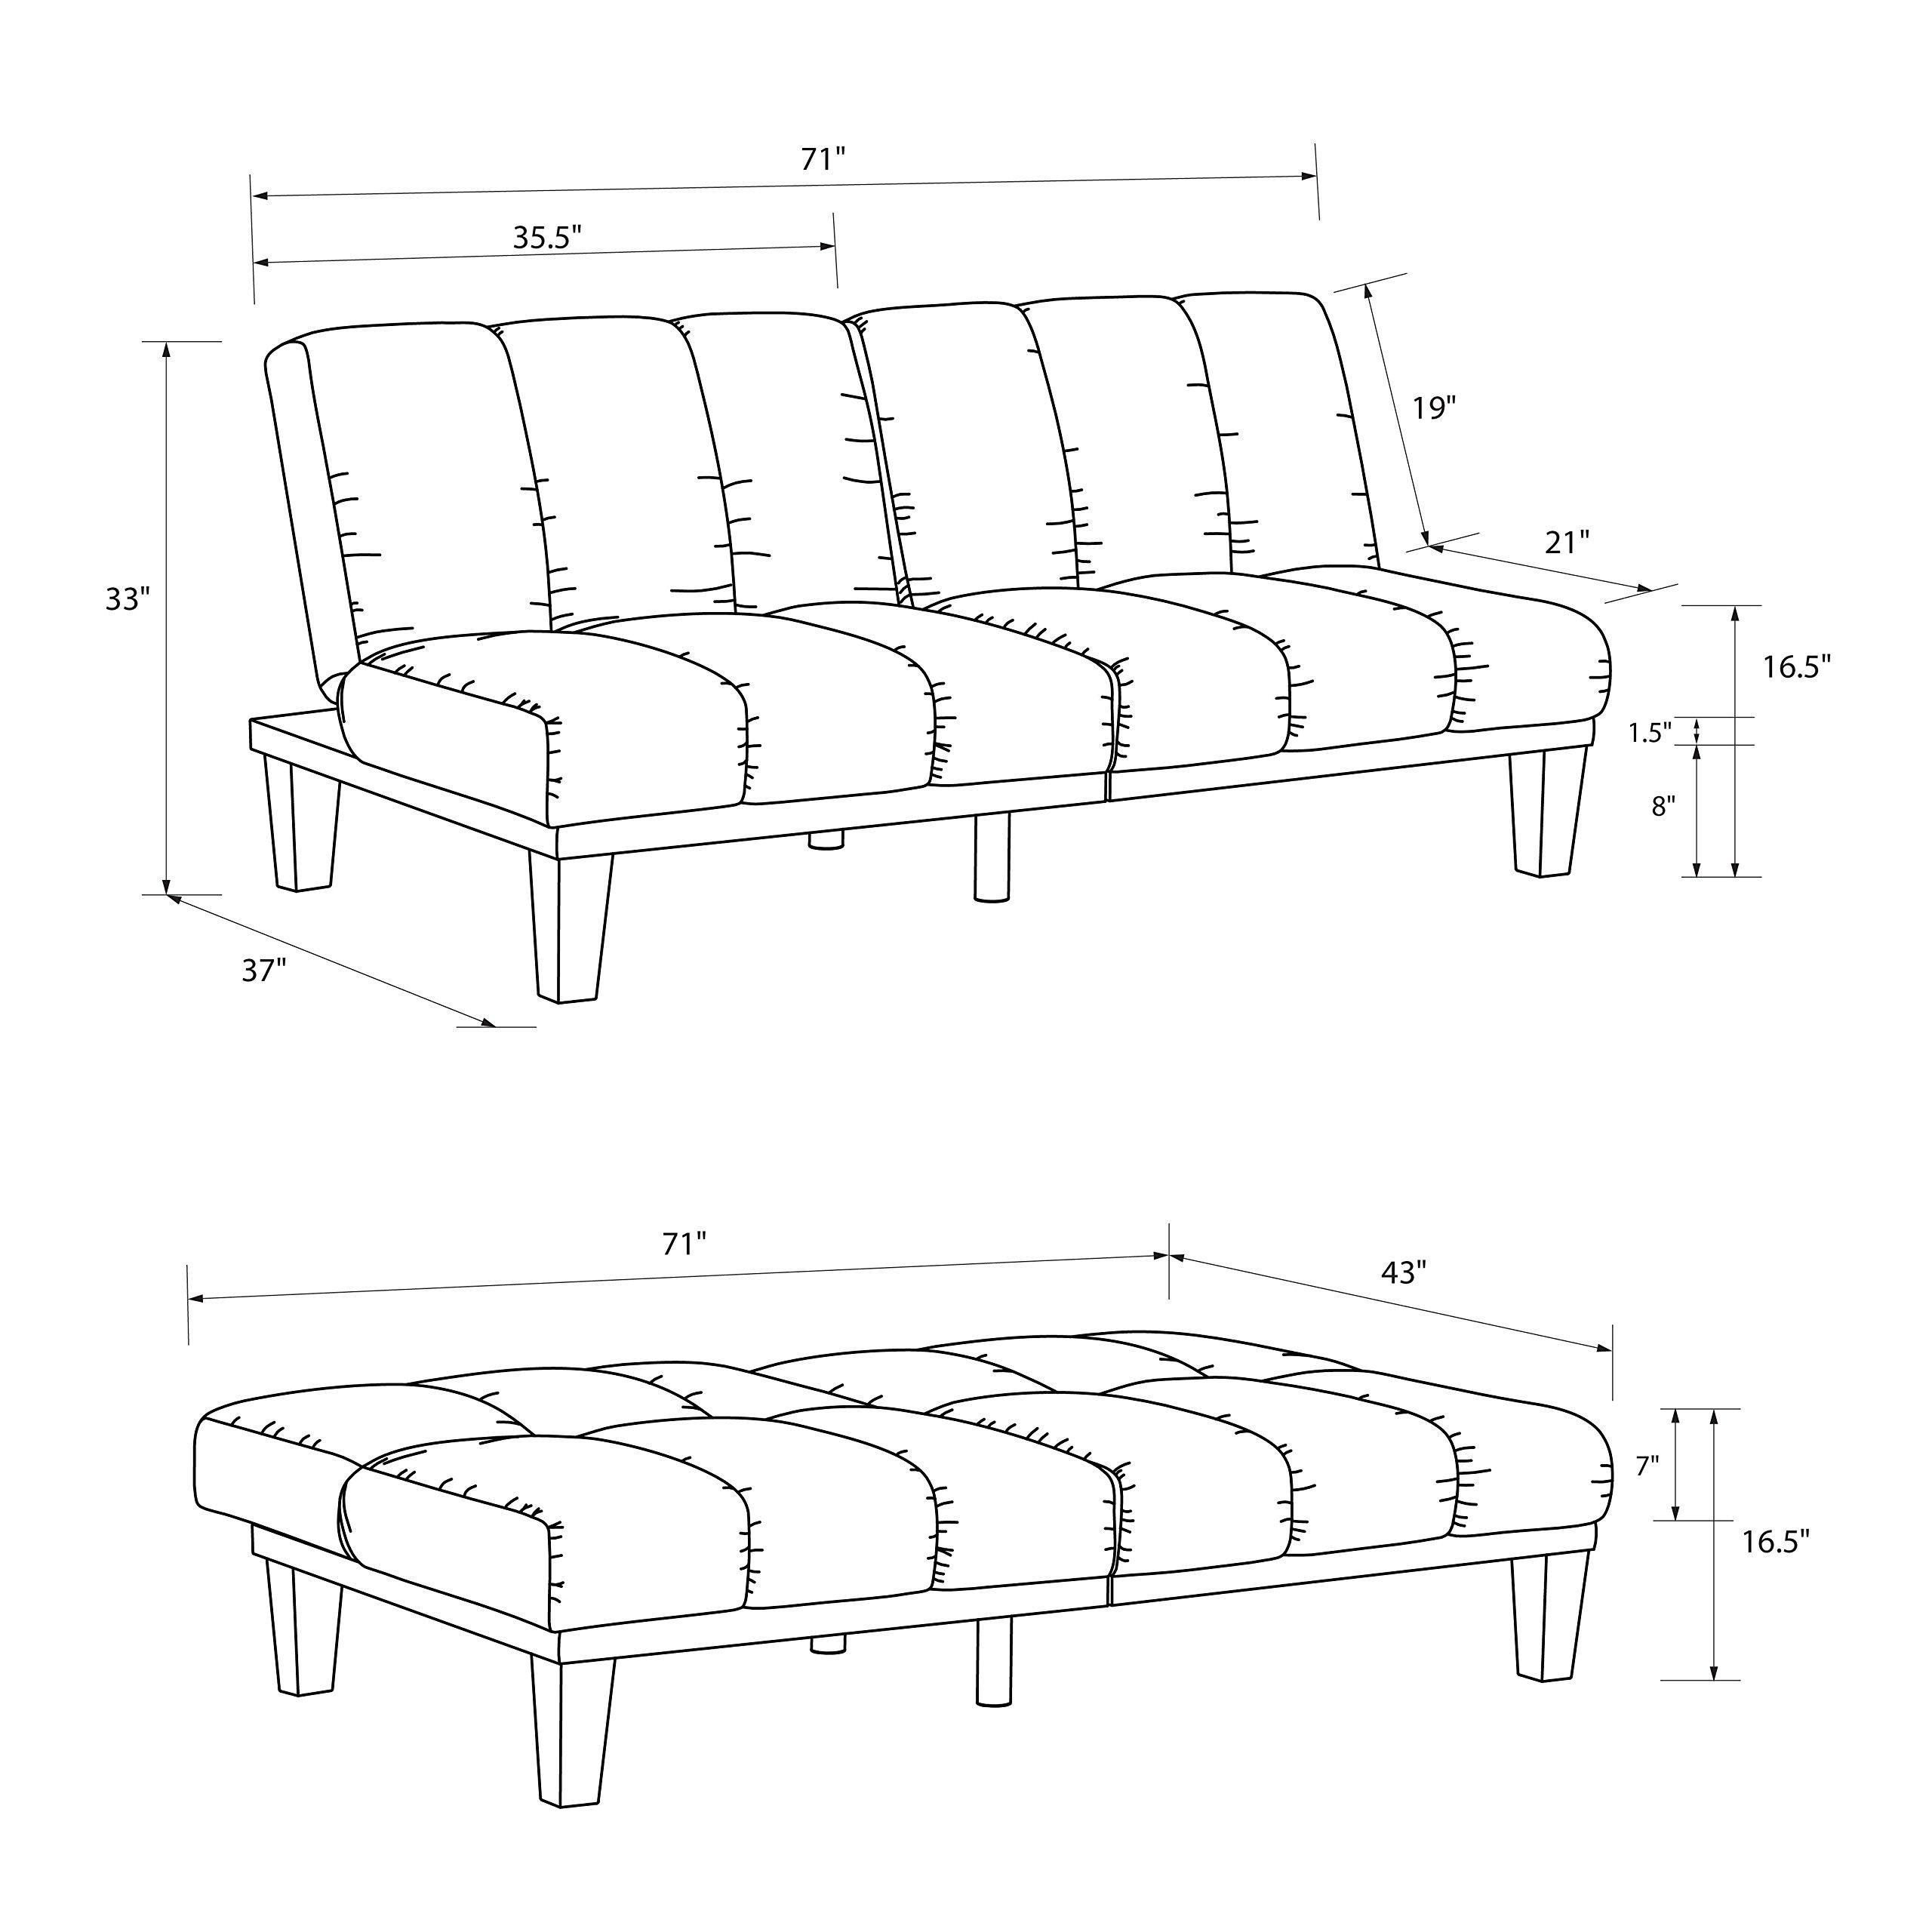 Hamilton Estate Premium Sofa Futon Sleeper Comfortable Plush Upholstery, Rich Black by DHP (Image #2)